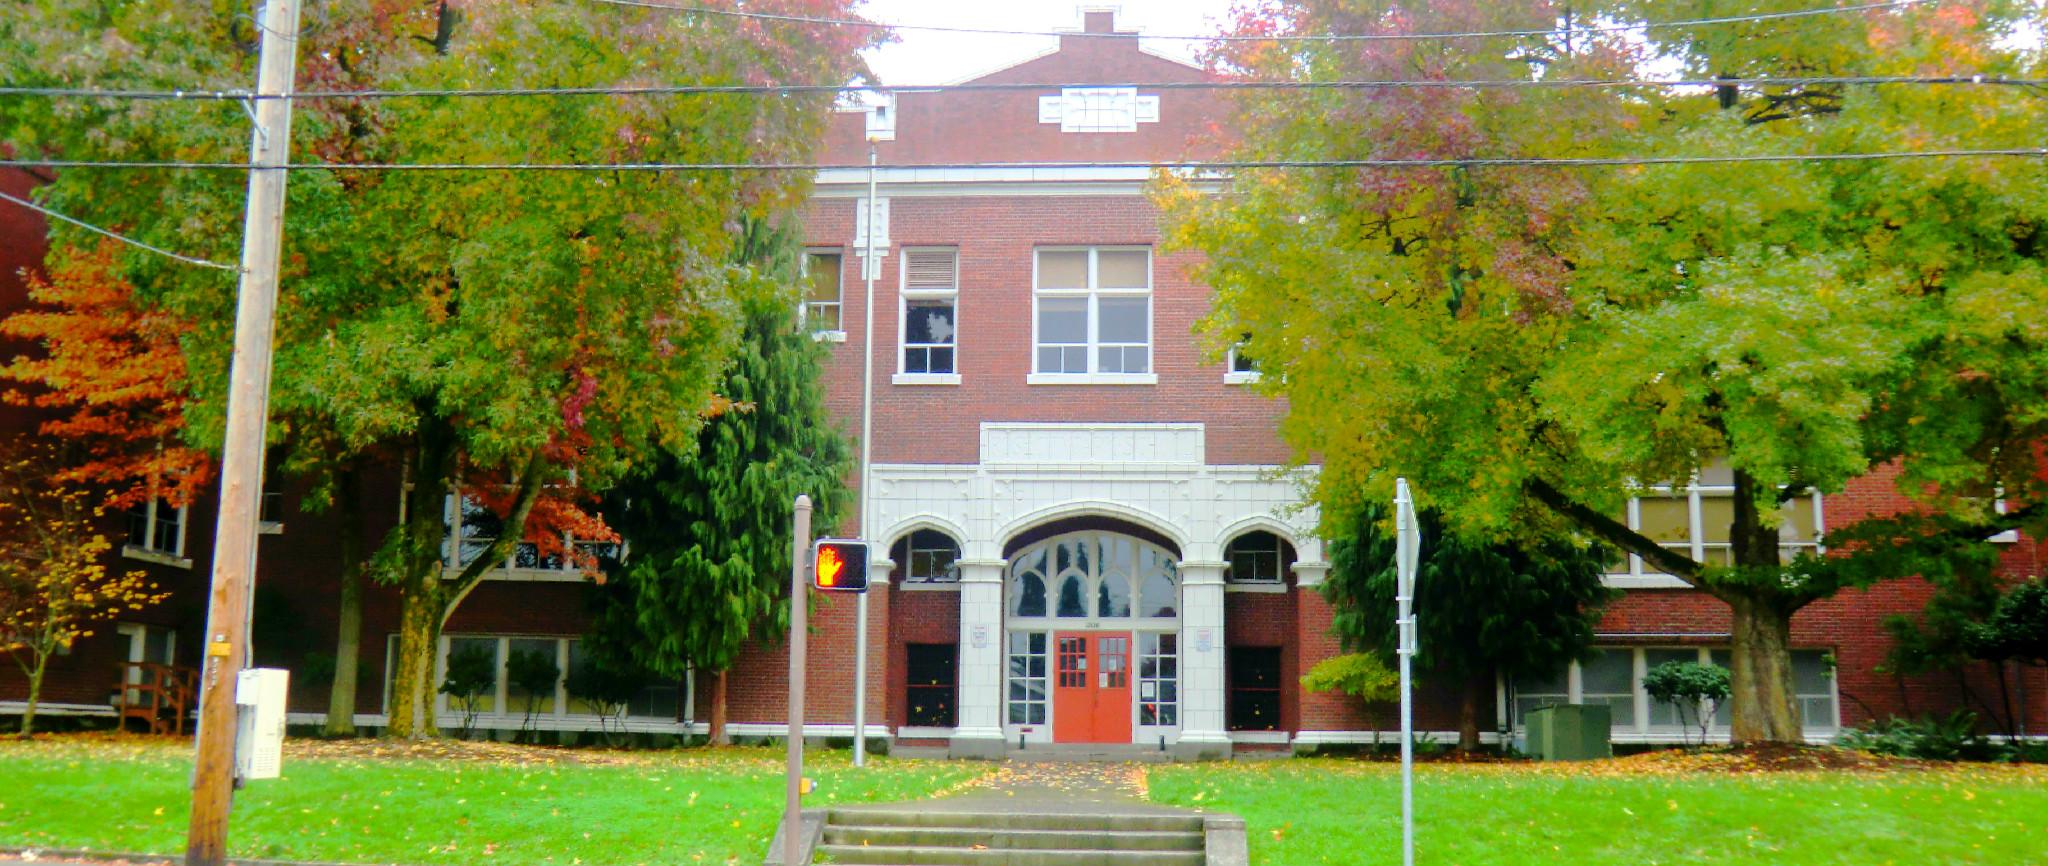 Rose City Park Elementary School